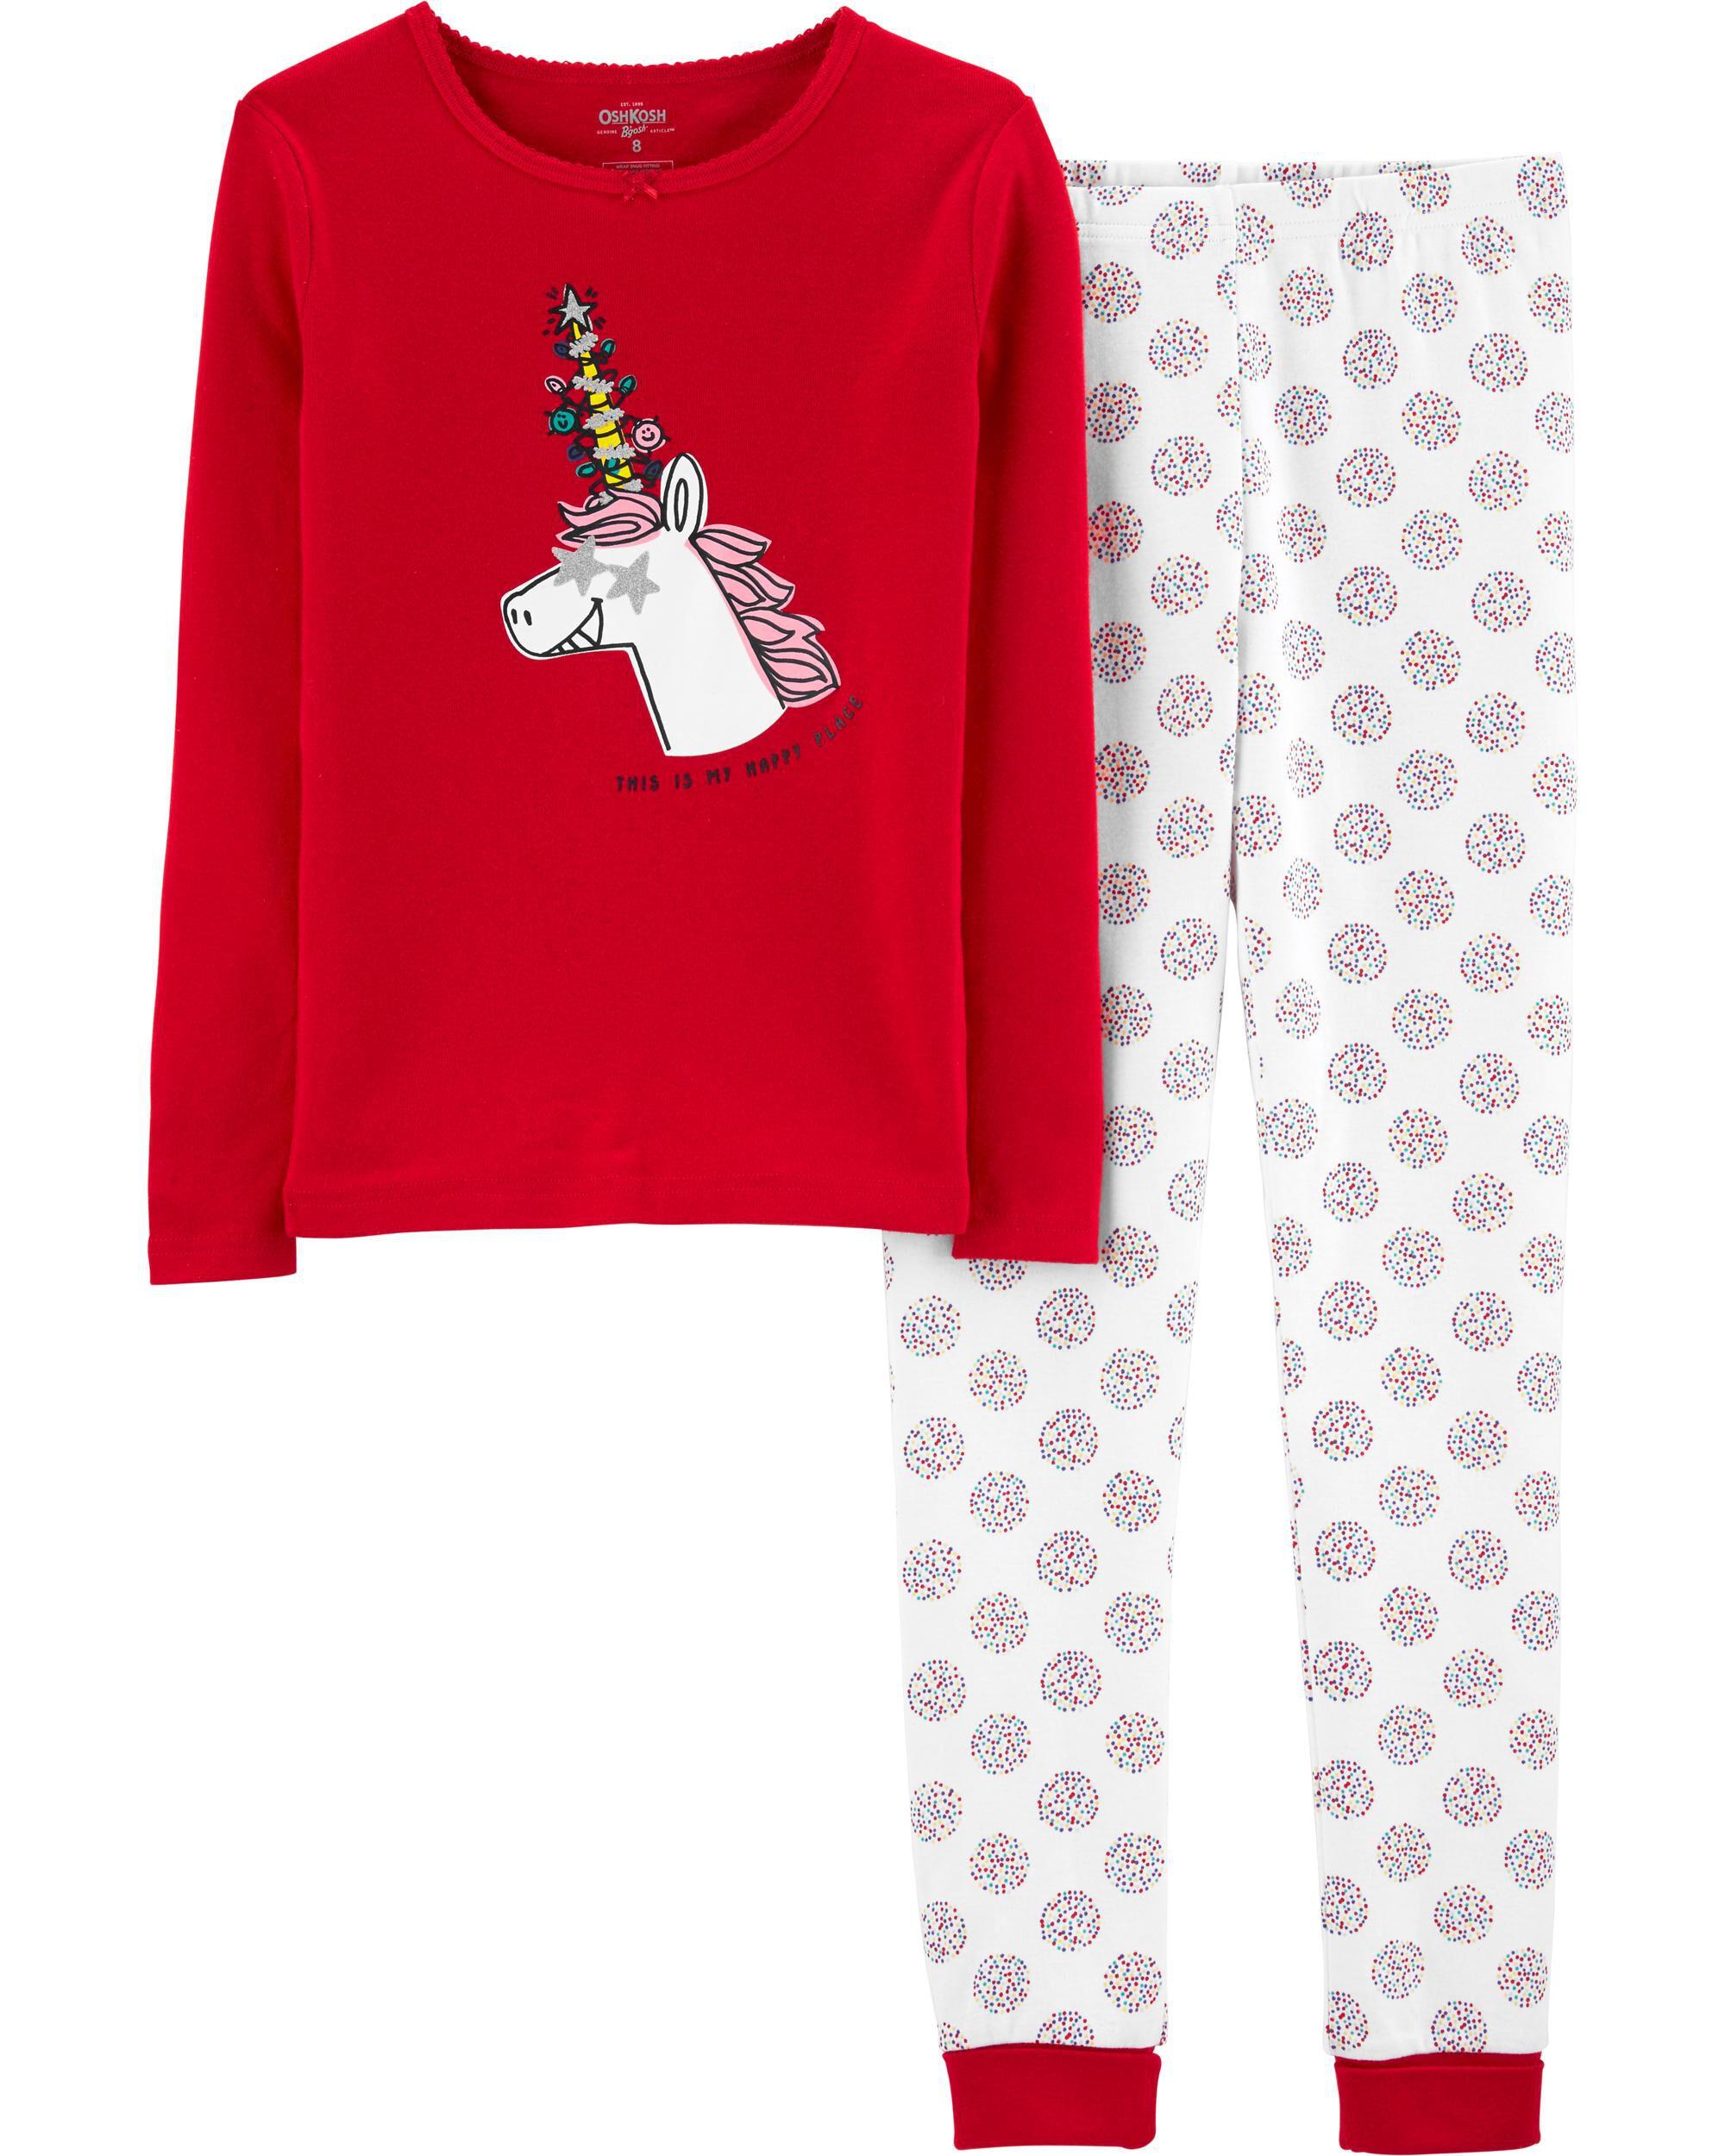 *DOORBUSTER* Snug Fit Holiday Unicorn Cotton PJs